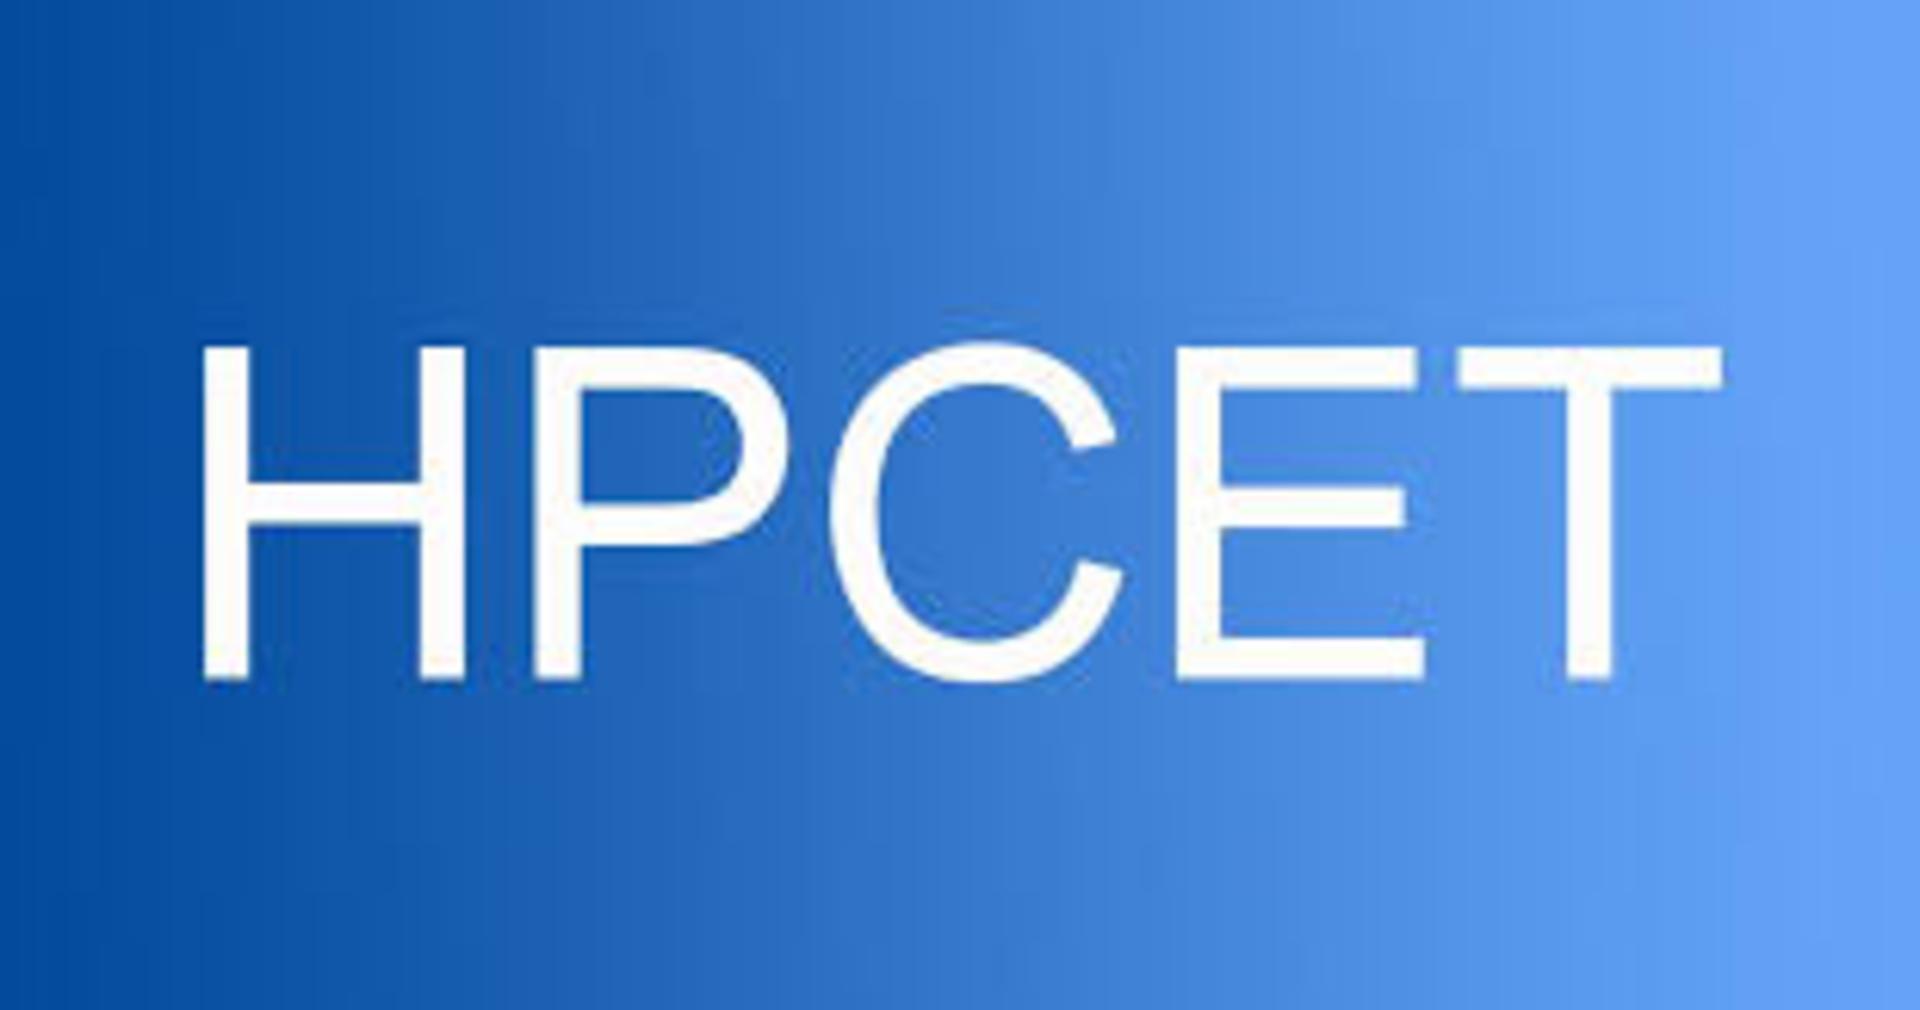 HP CET 2019 image